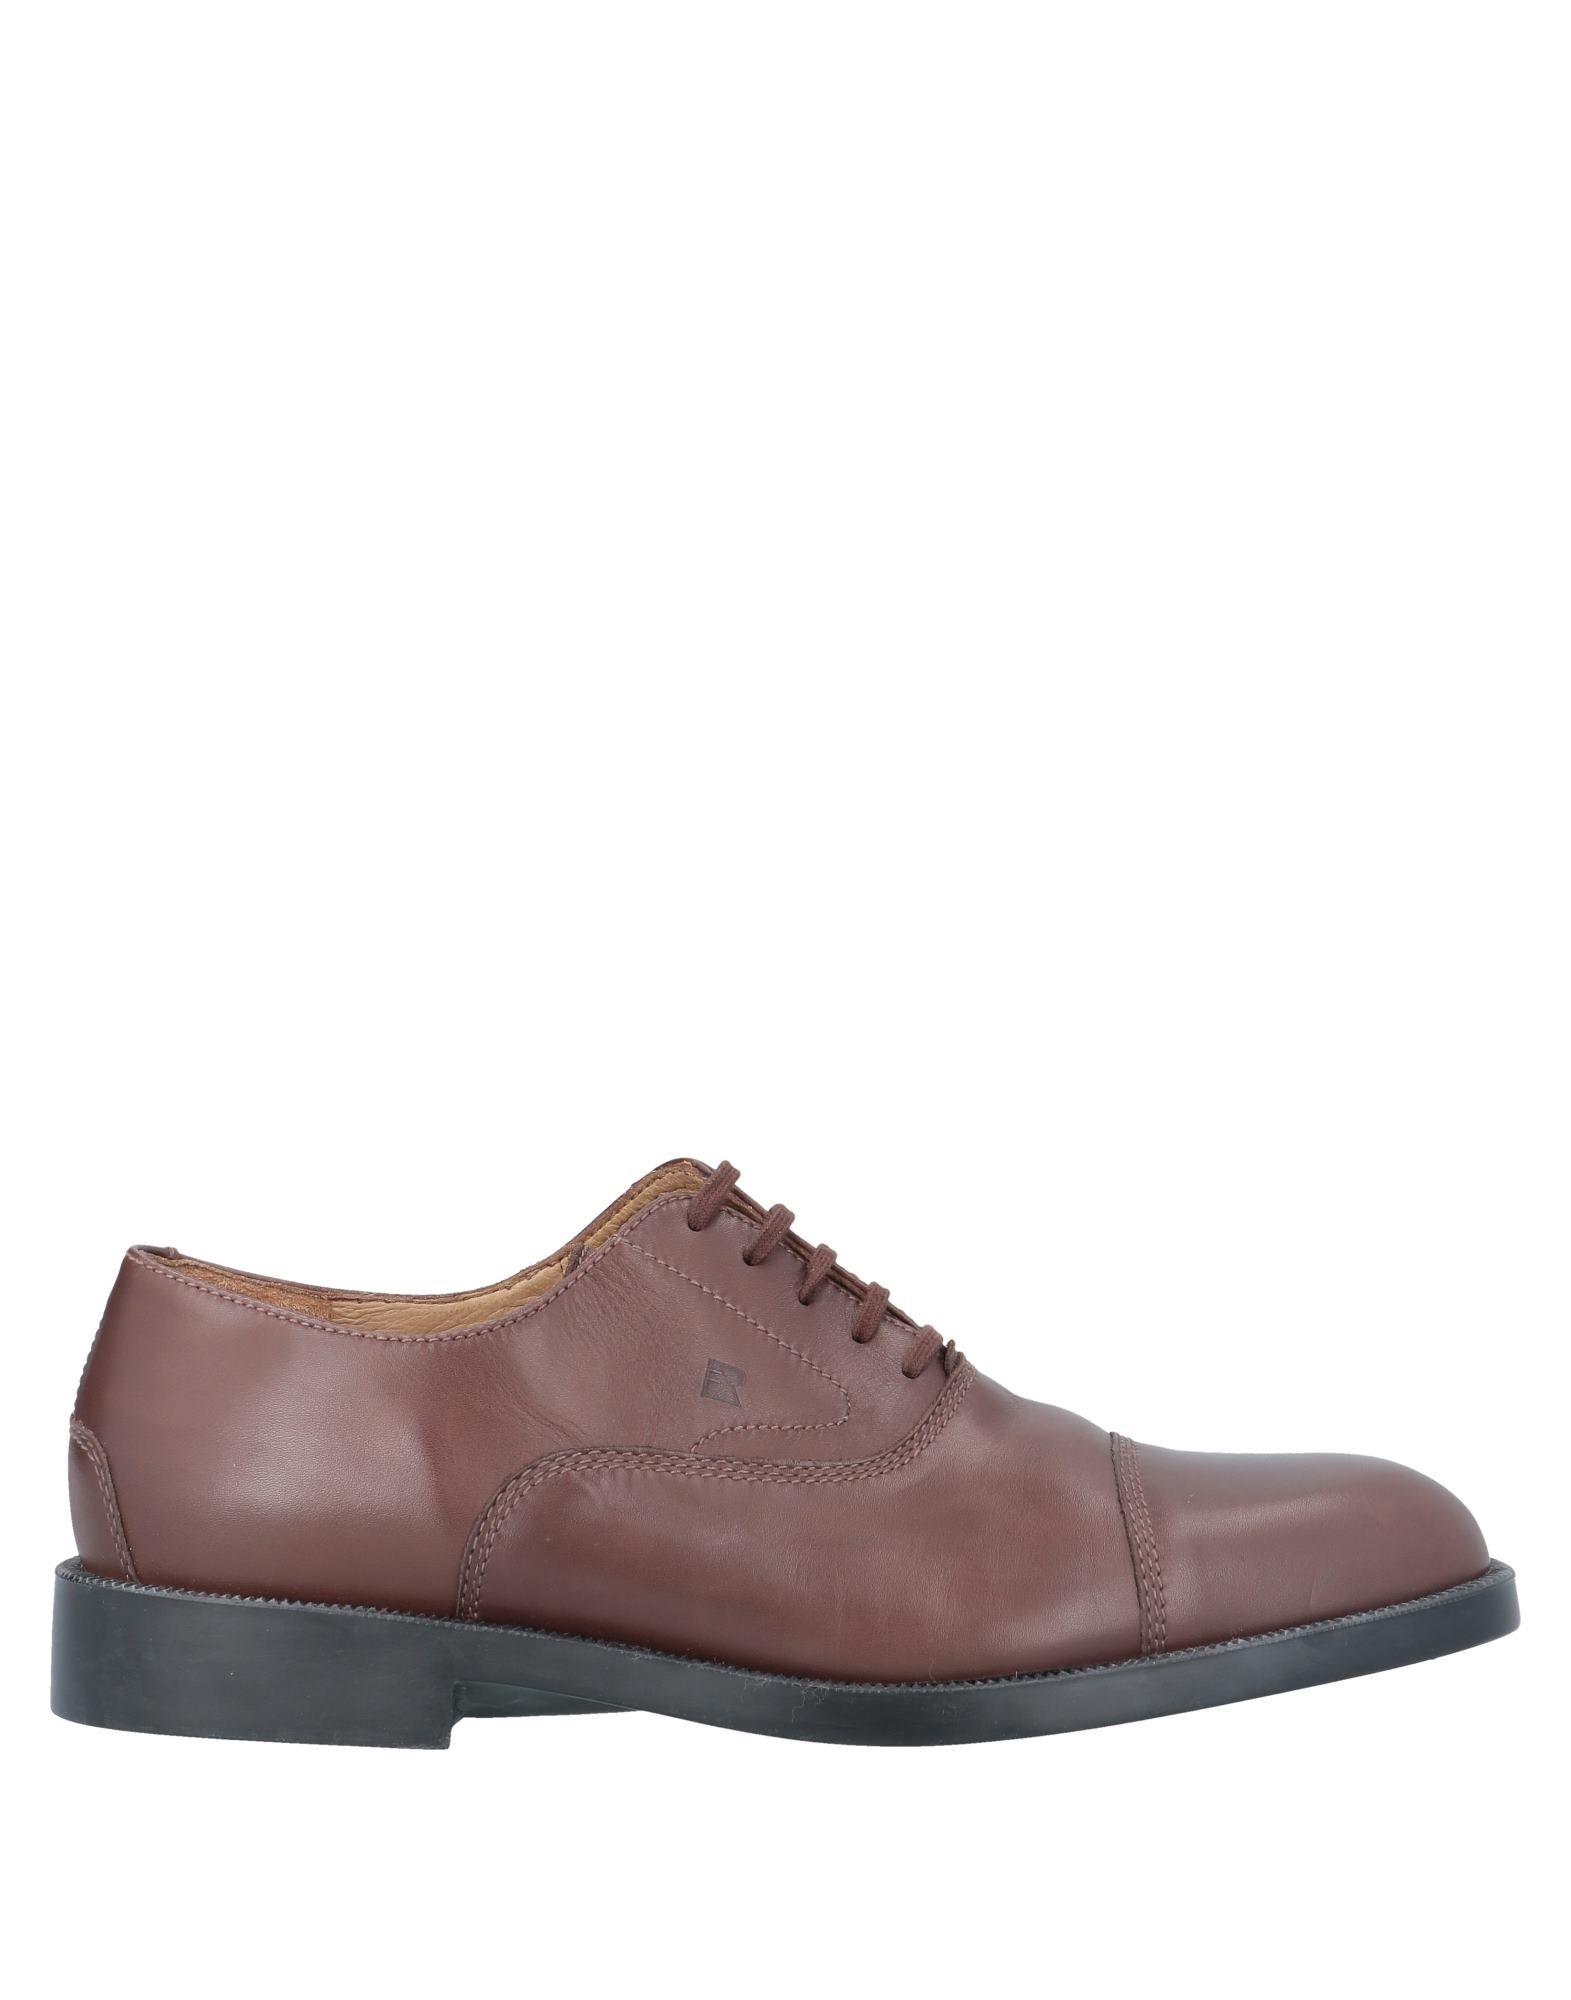 FLEXA by FRATELLI ROSSETTI Обувь на шнурках mares vest flexa 5 3mm man